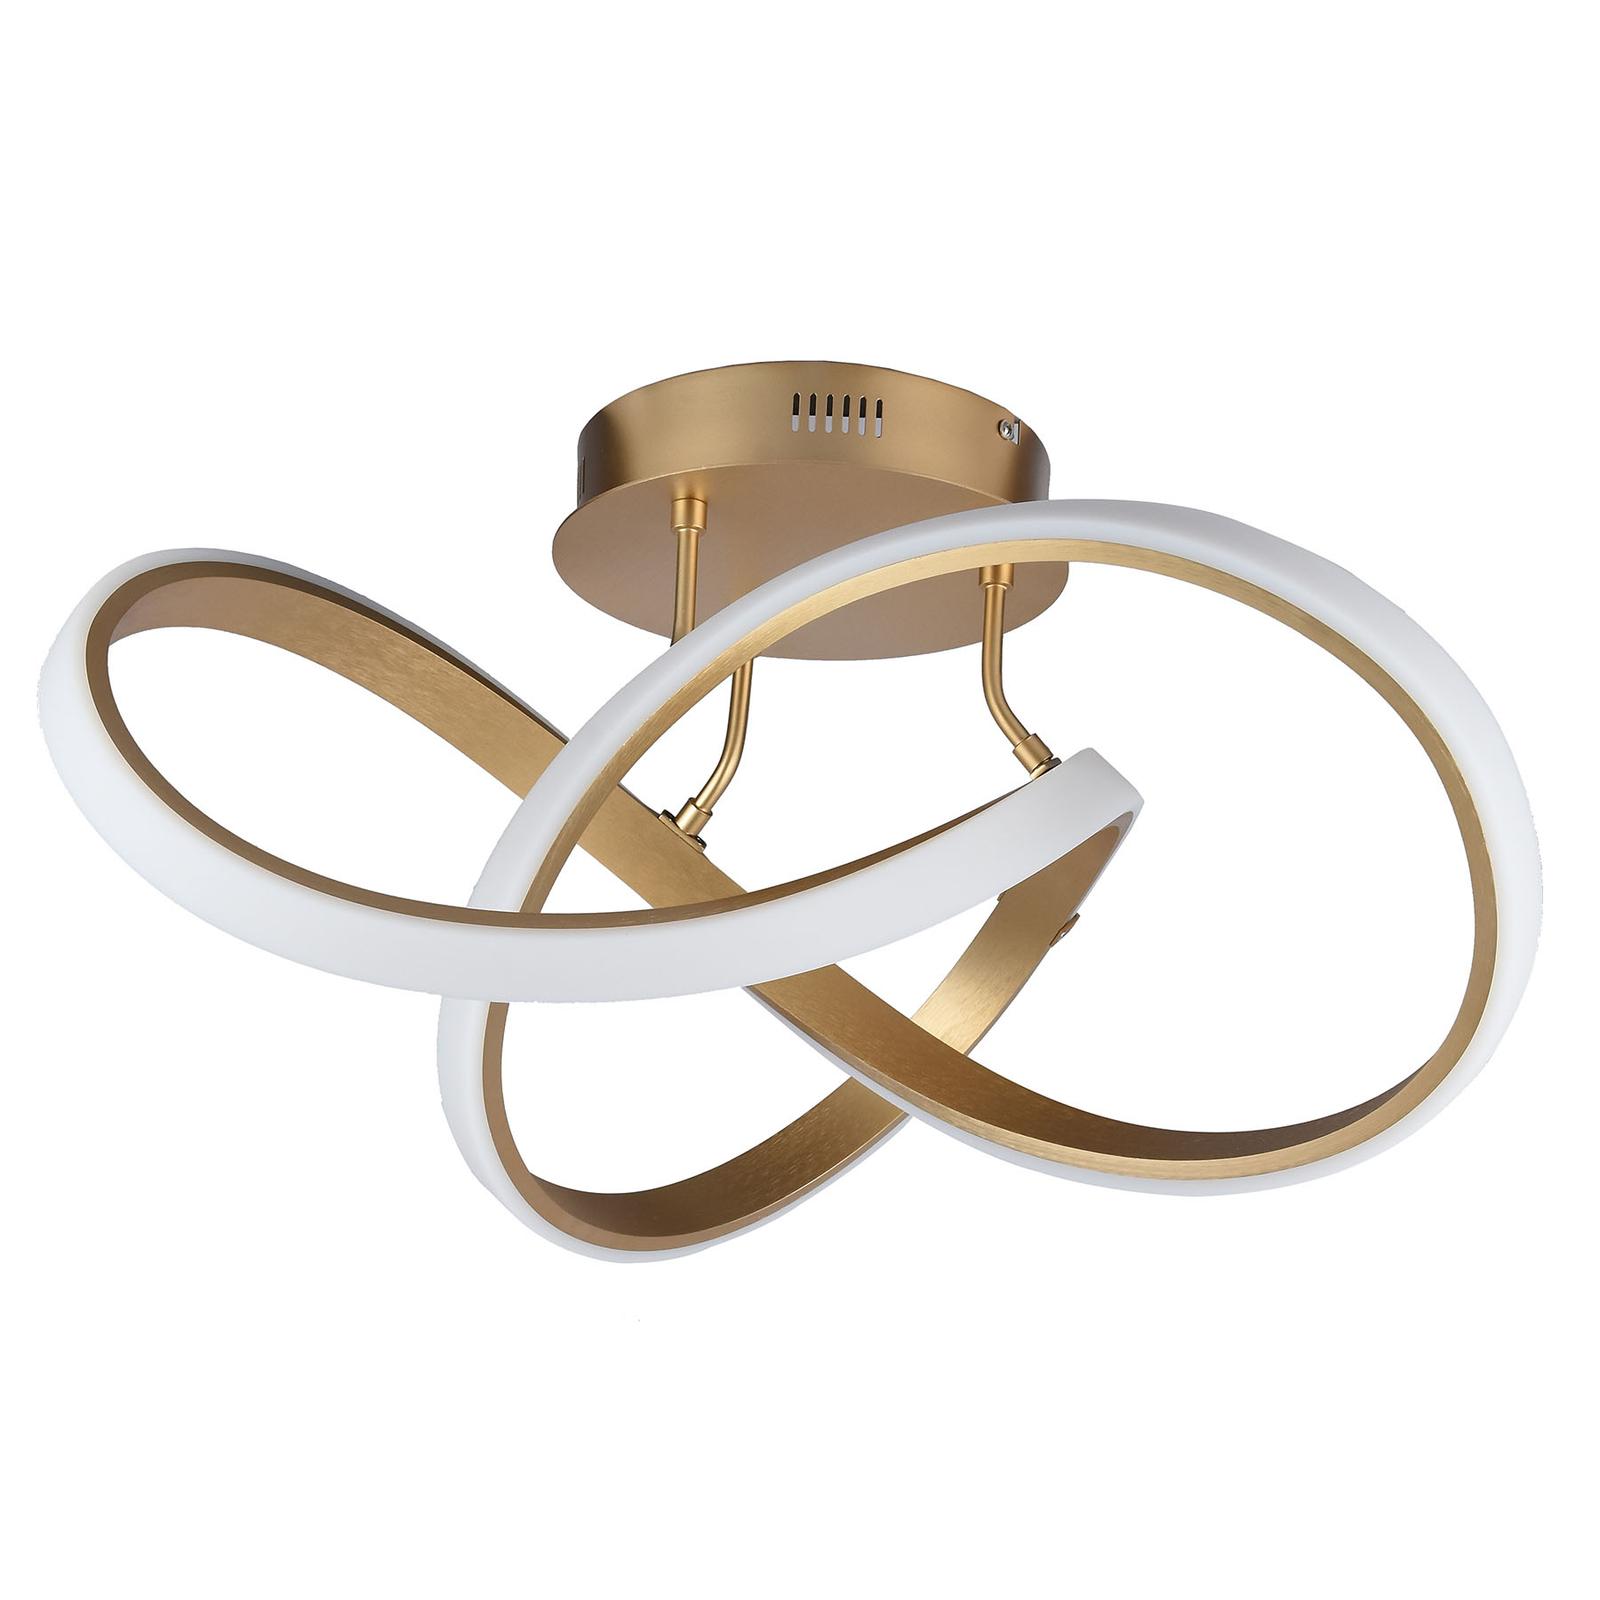 Plafoniera LED Indigo, 1 luce, oro satinato